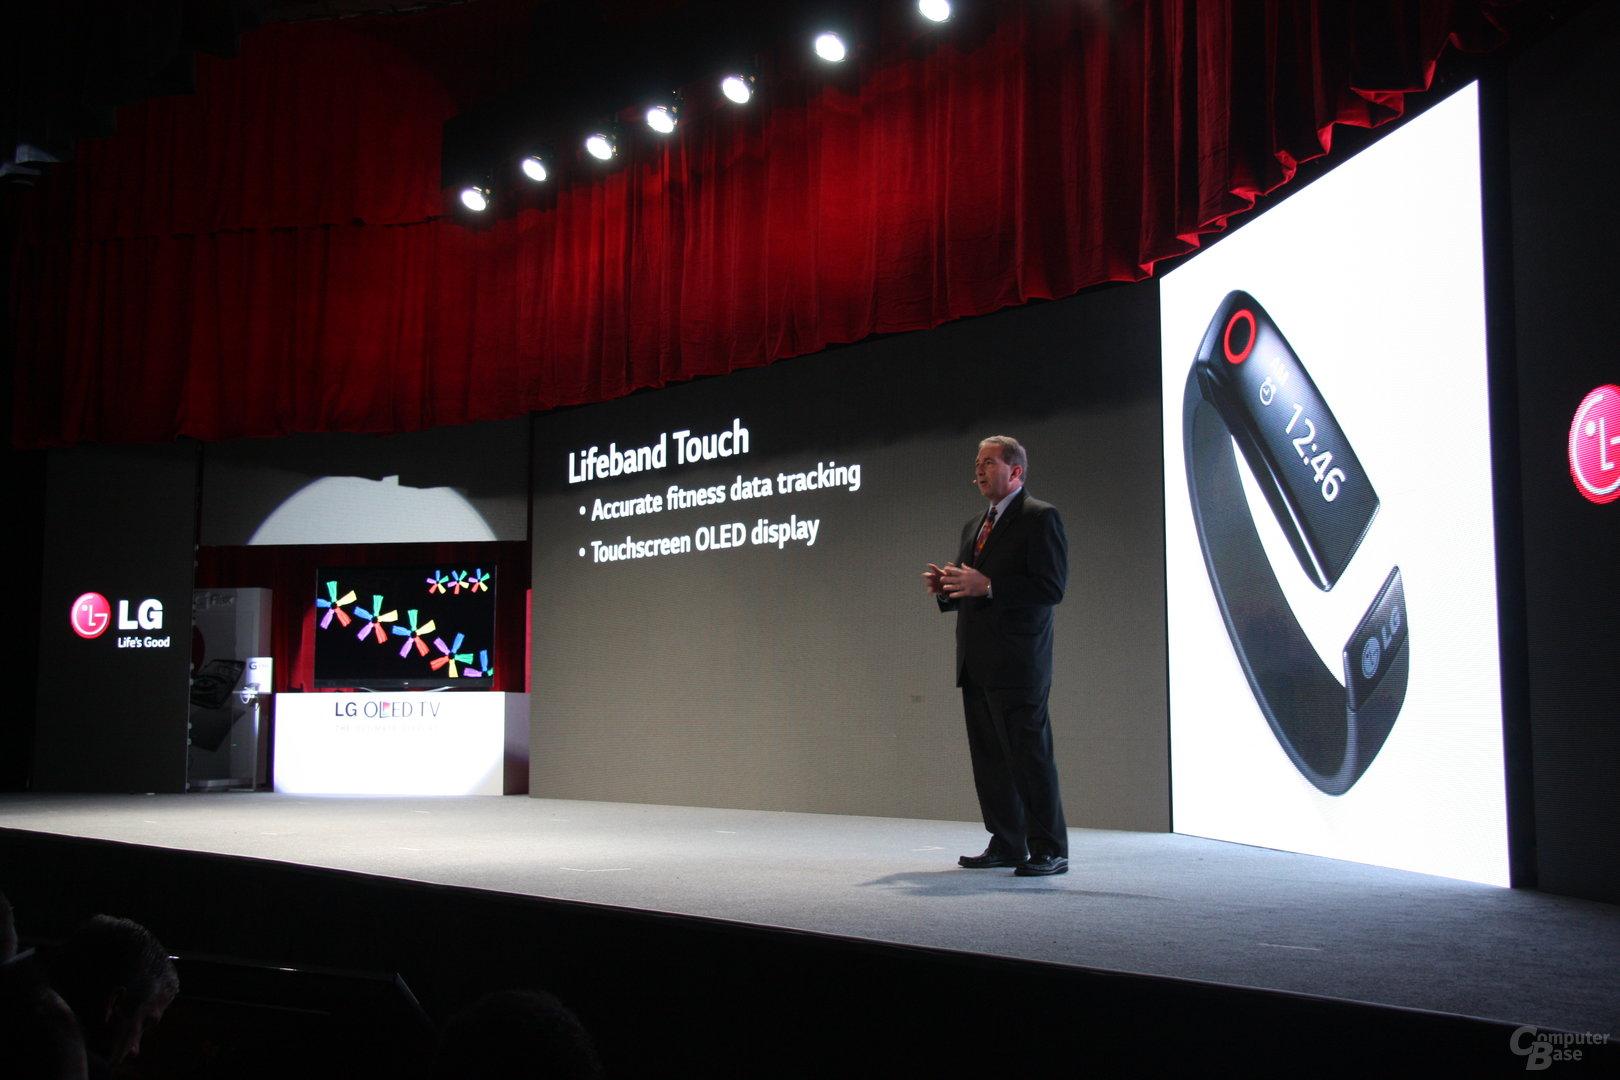 Präsentation des LG Lifeband Touch